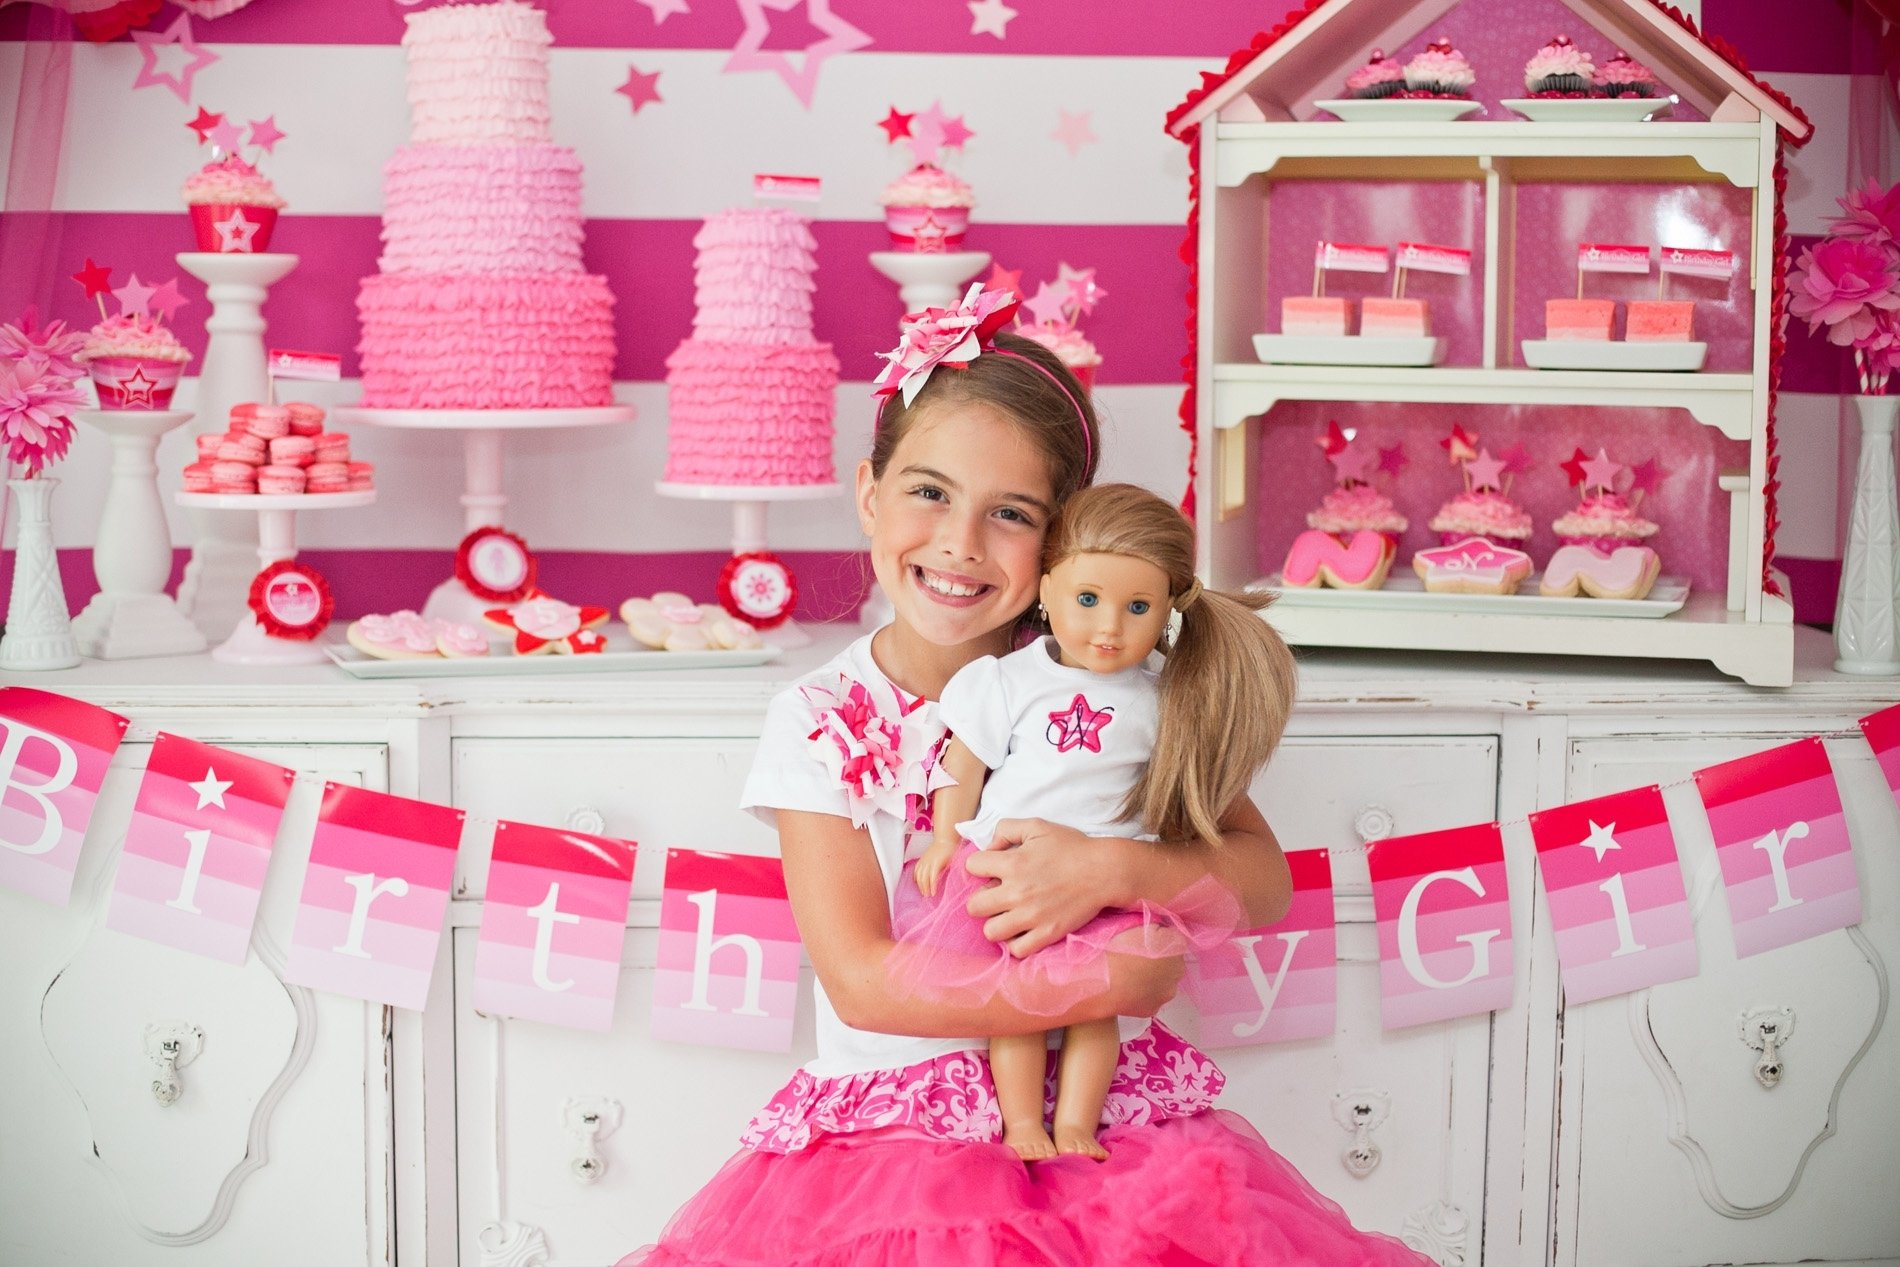 10 Great American Girl Doll Birthday Party Ideas inspired american girl doll birthday party anders ruff 2020